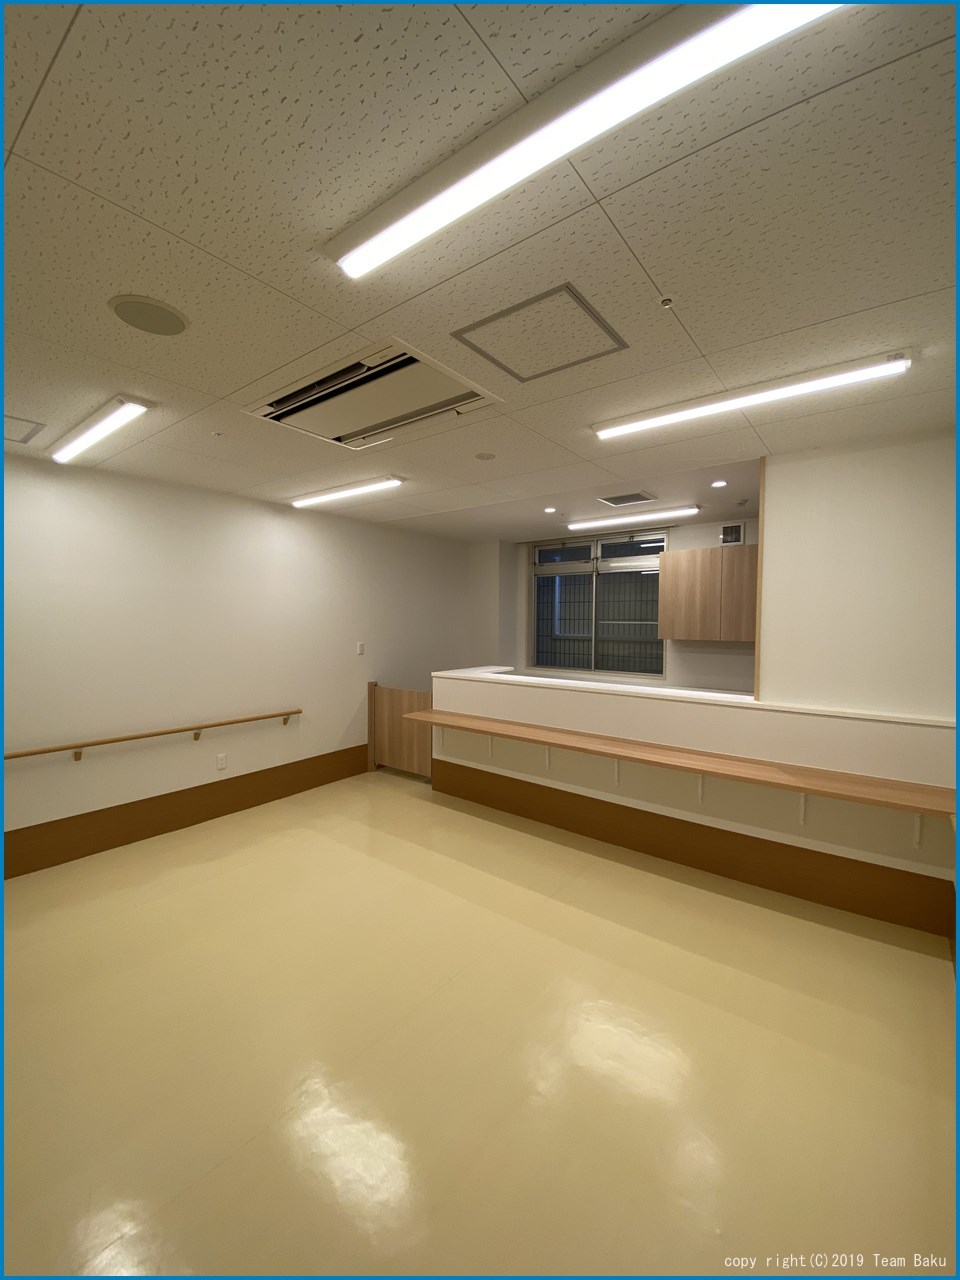 N病院グループ Nナーシング南館 改修・増築工事 5_c0376508_13044523.jpg